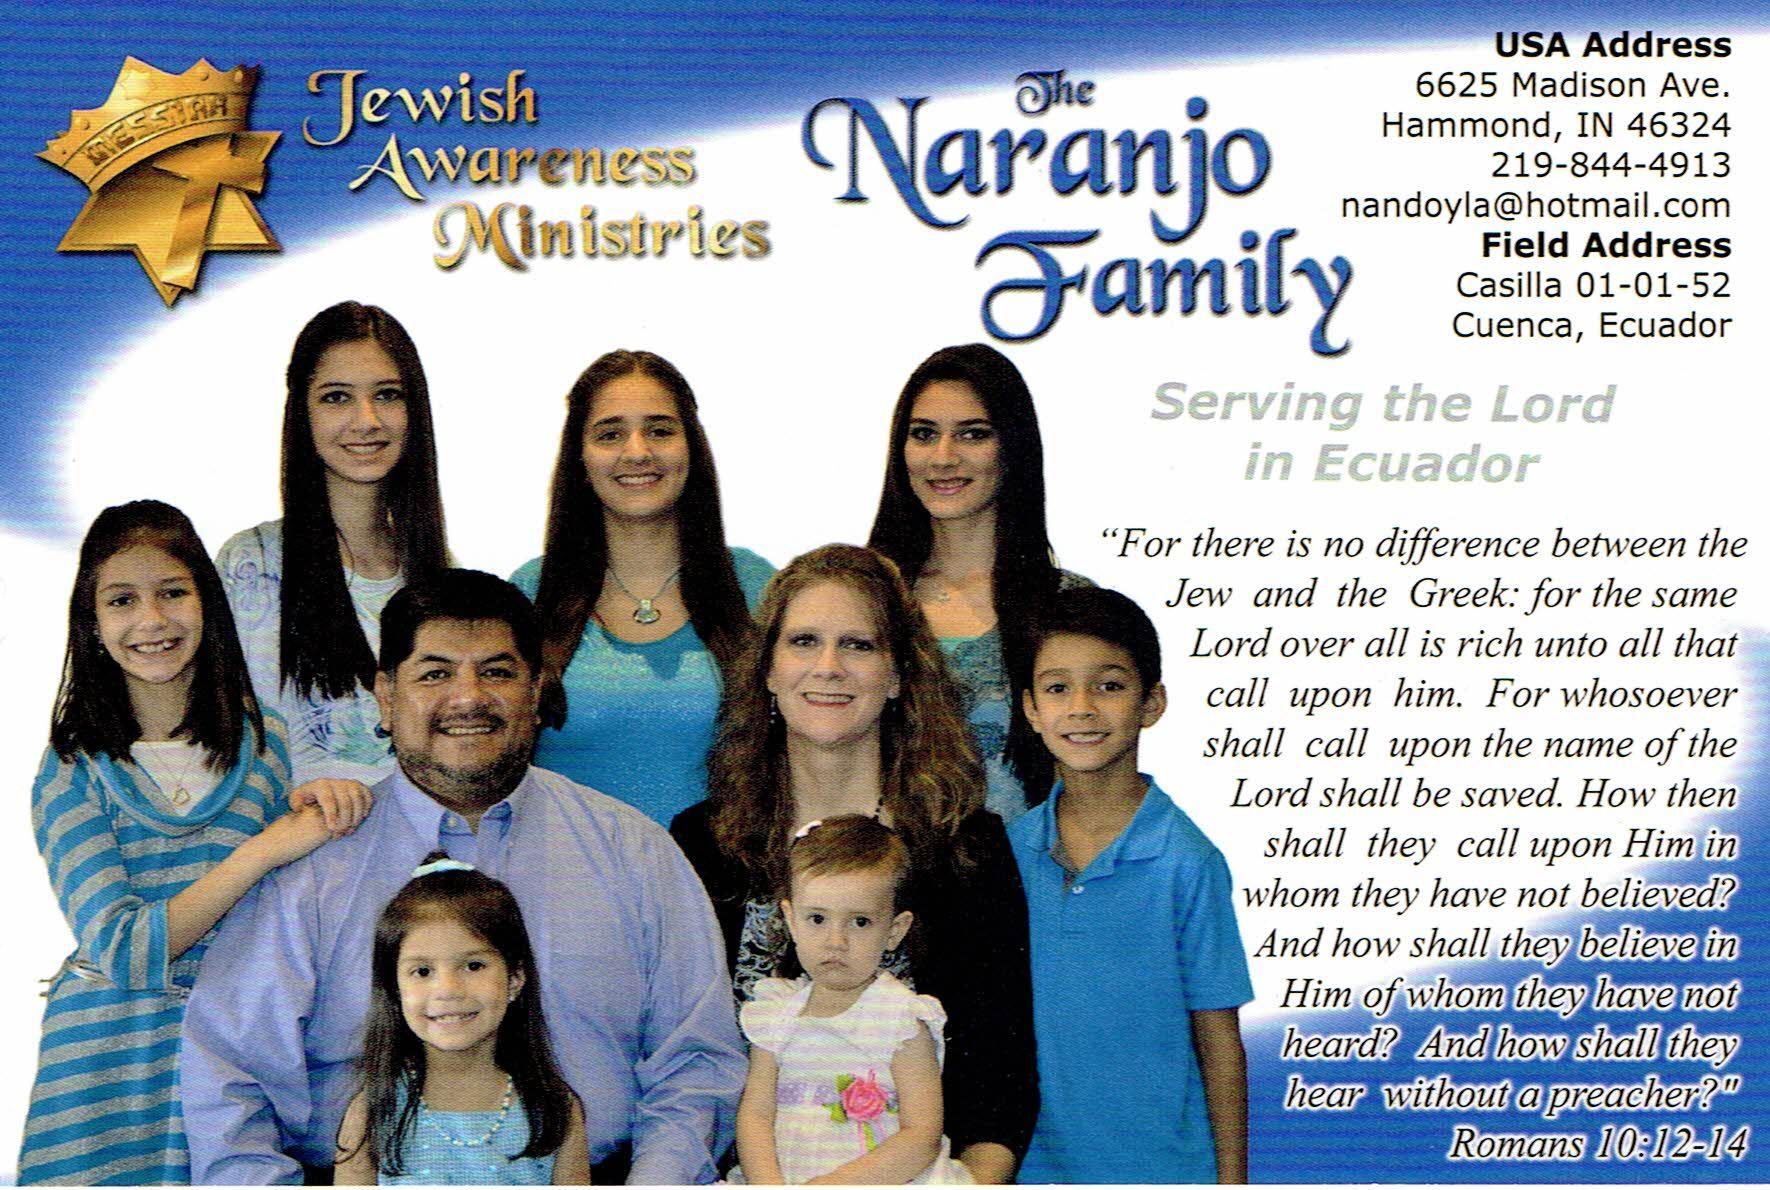 The Narajos